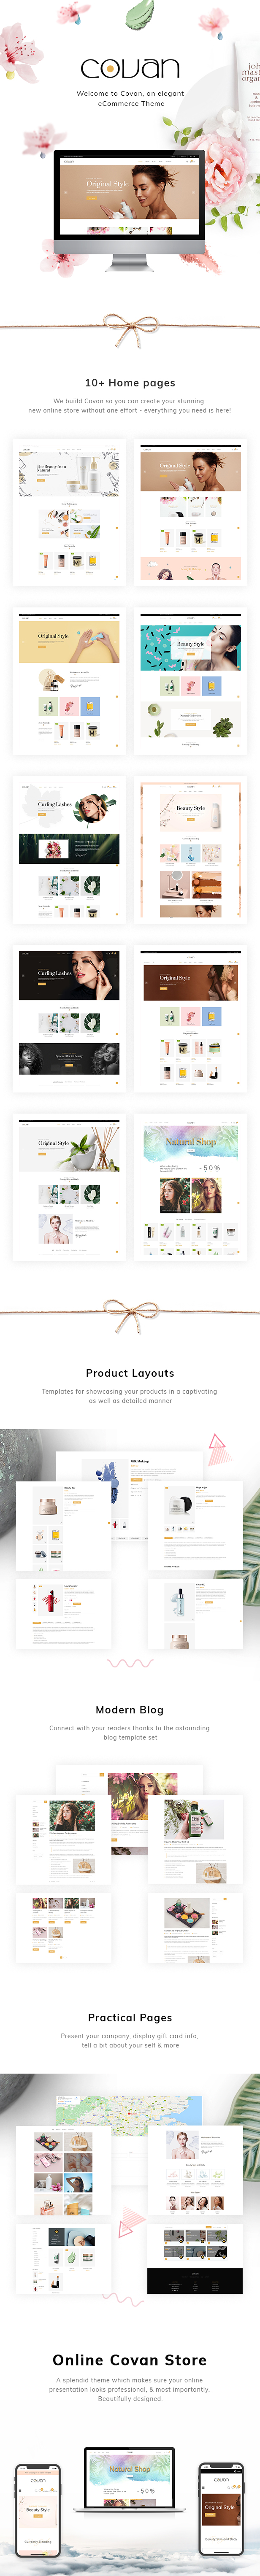 Covan – Cosmetics WooCommerce WordPress Theme - 1